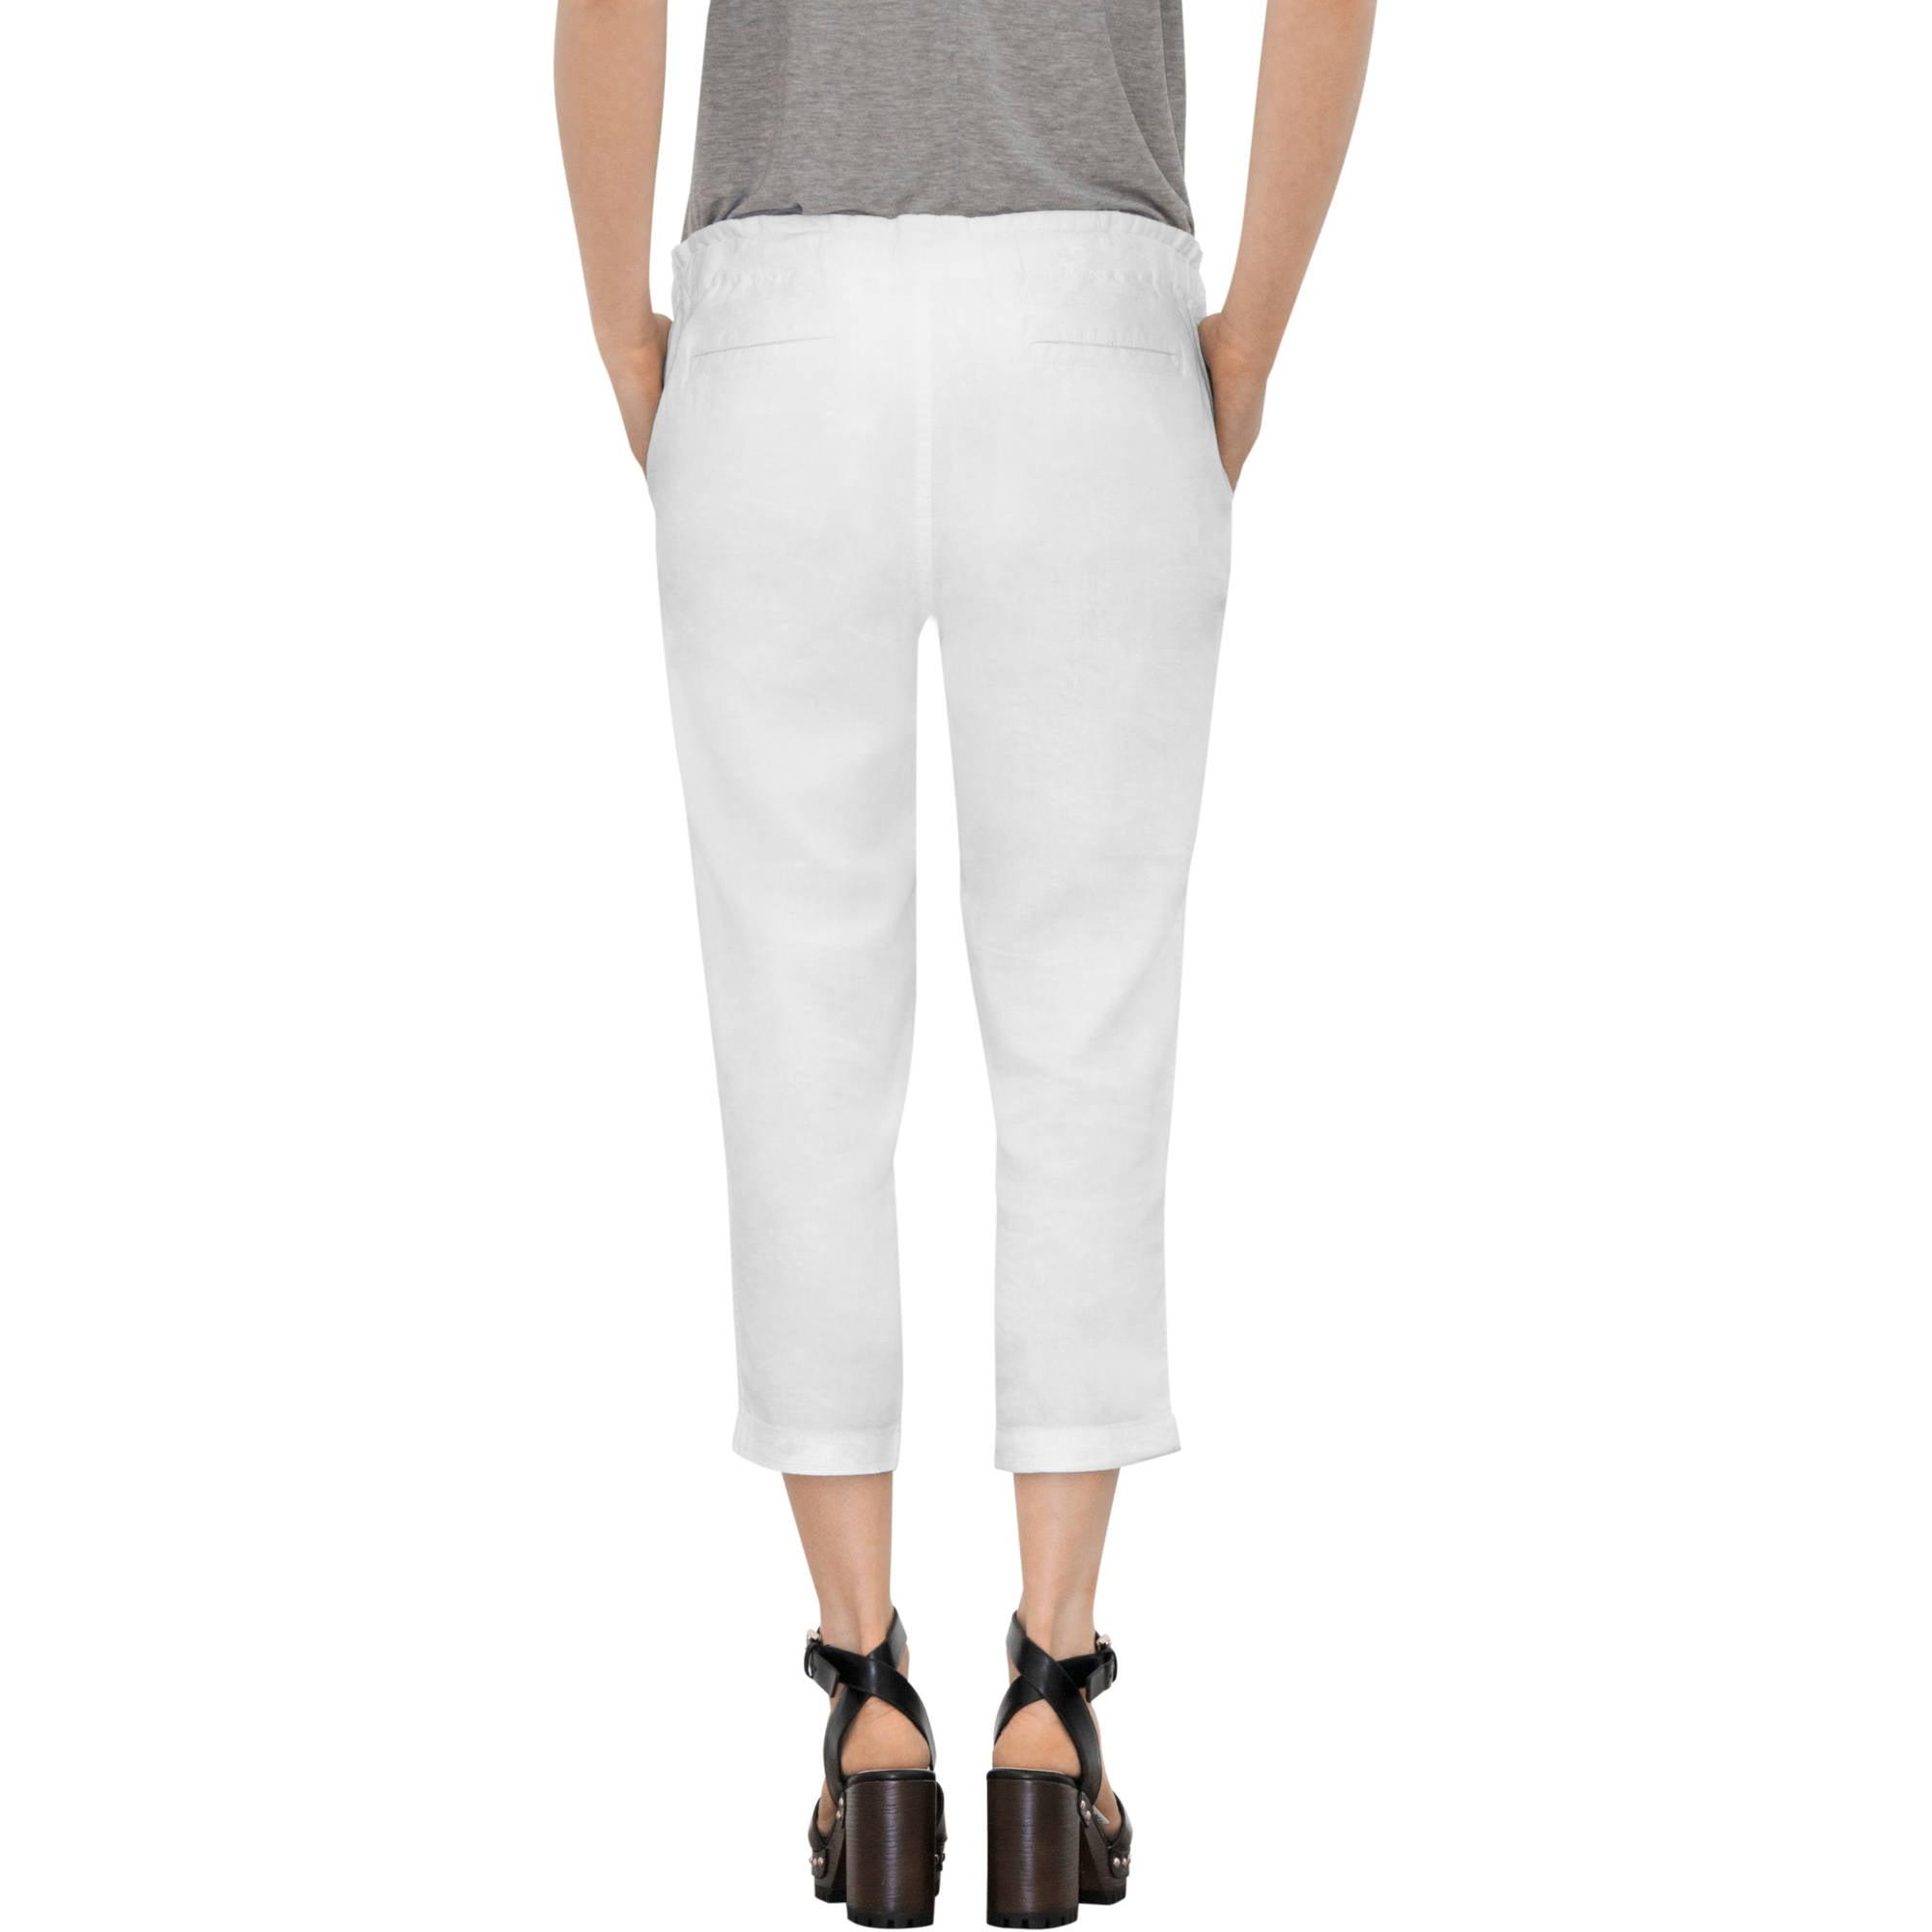 faded glory women's drawstring linen capri pants - walmart